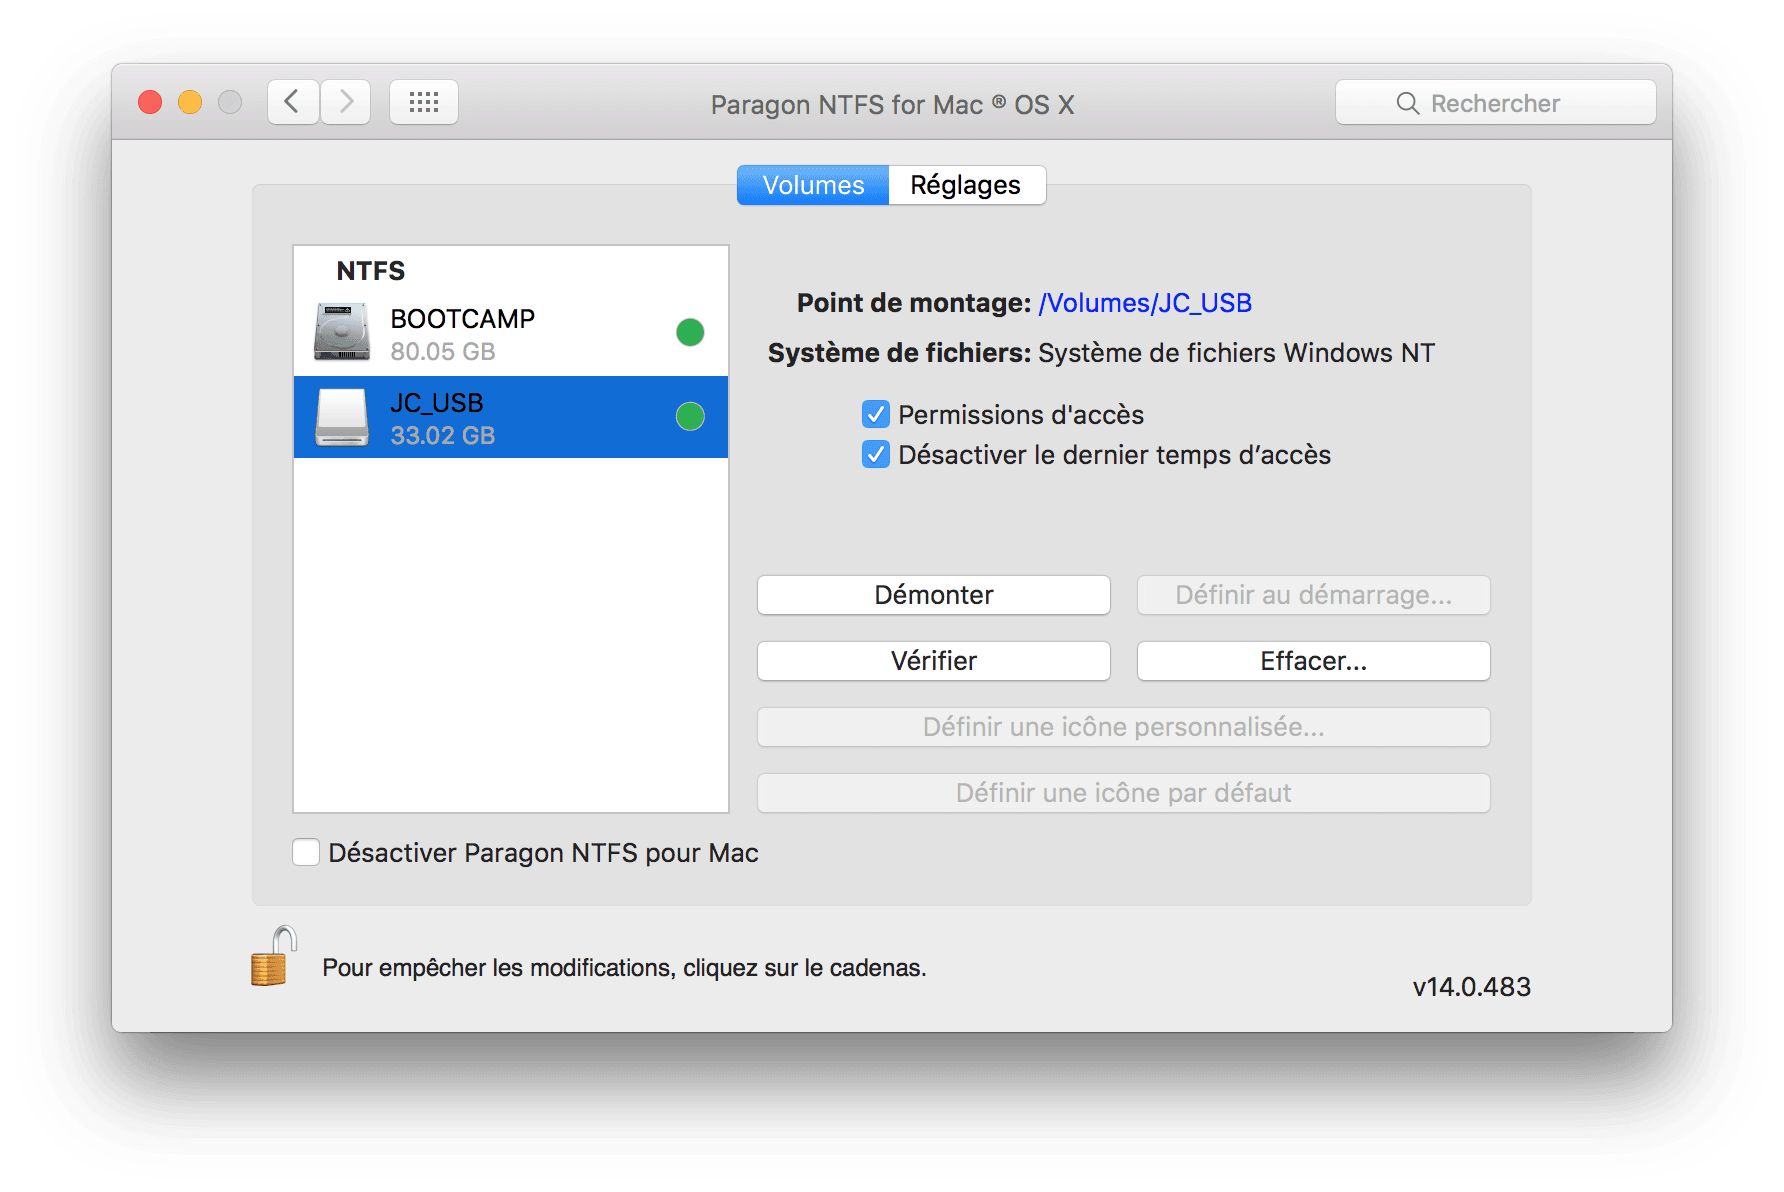 NTFS Mac OS X X X El Capitan: escribir en un volumen de Windows